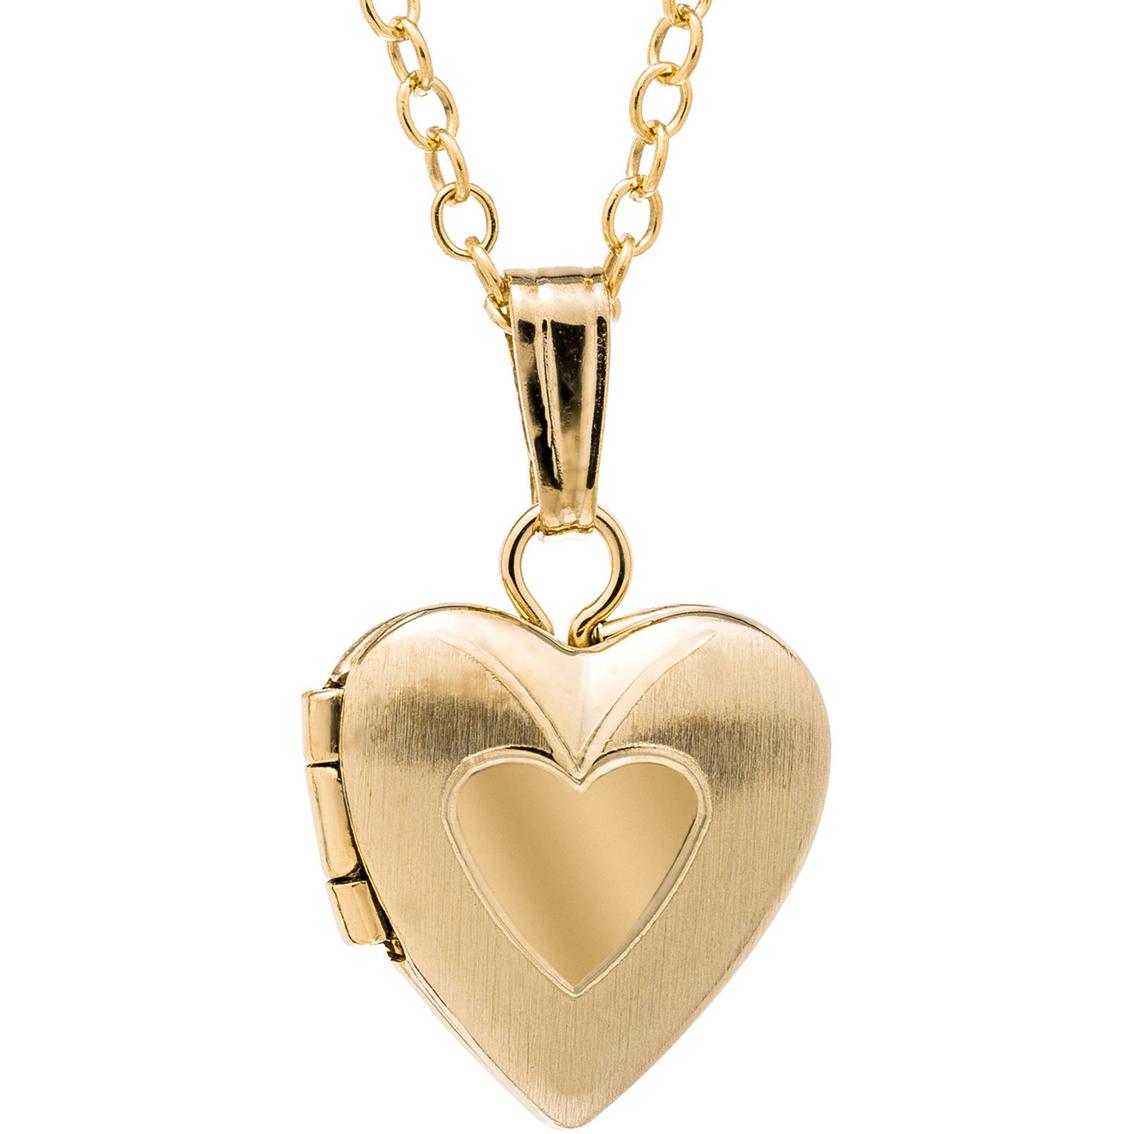 54f4d2783 Kids 14k Yellow Gold Filled Hand Engraved Heart Locket   Children's ...